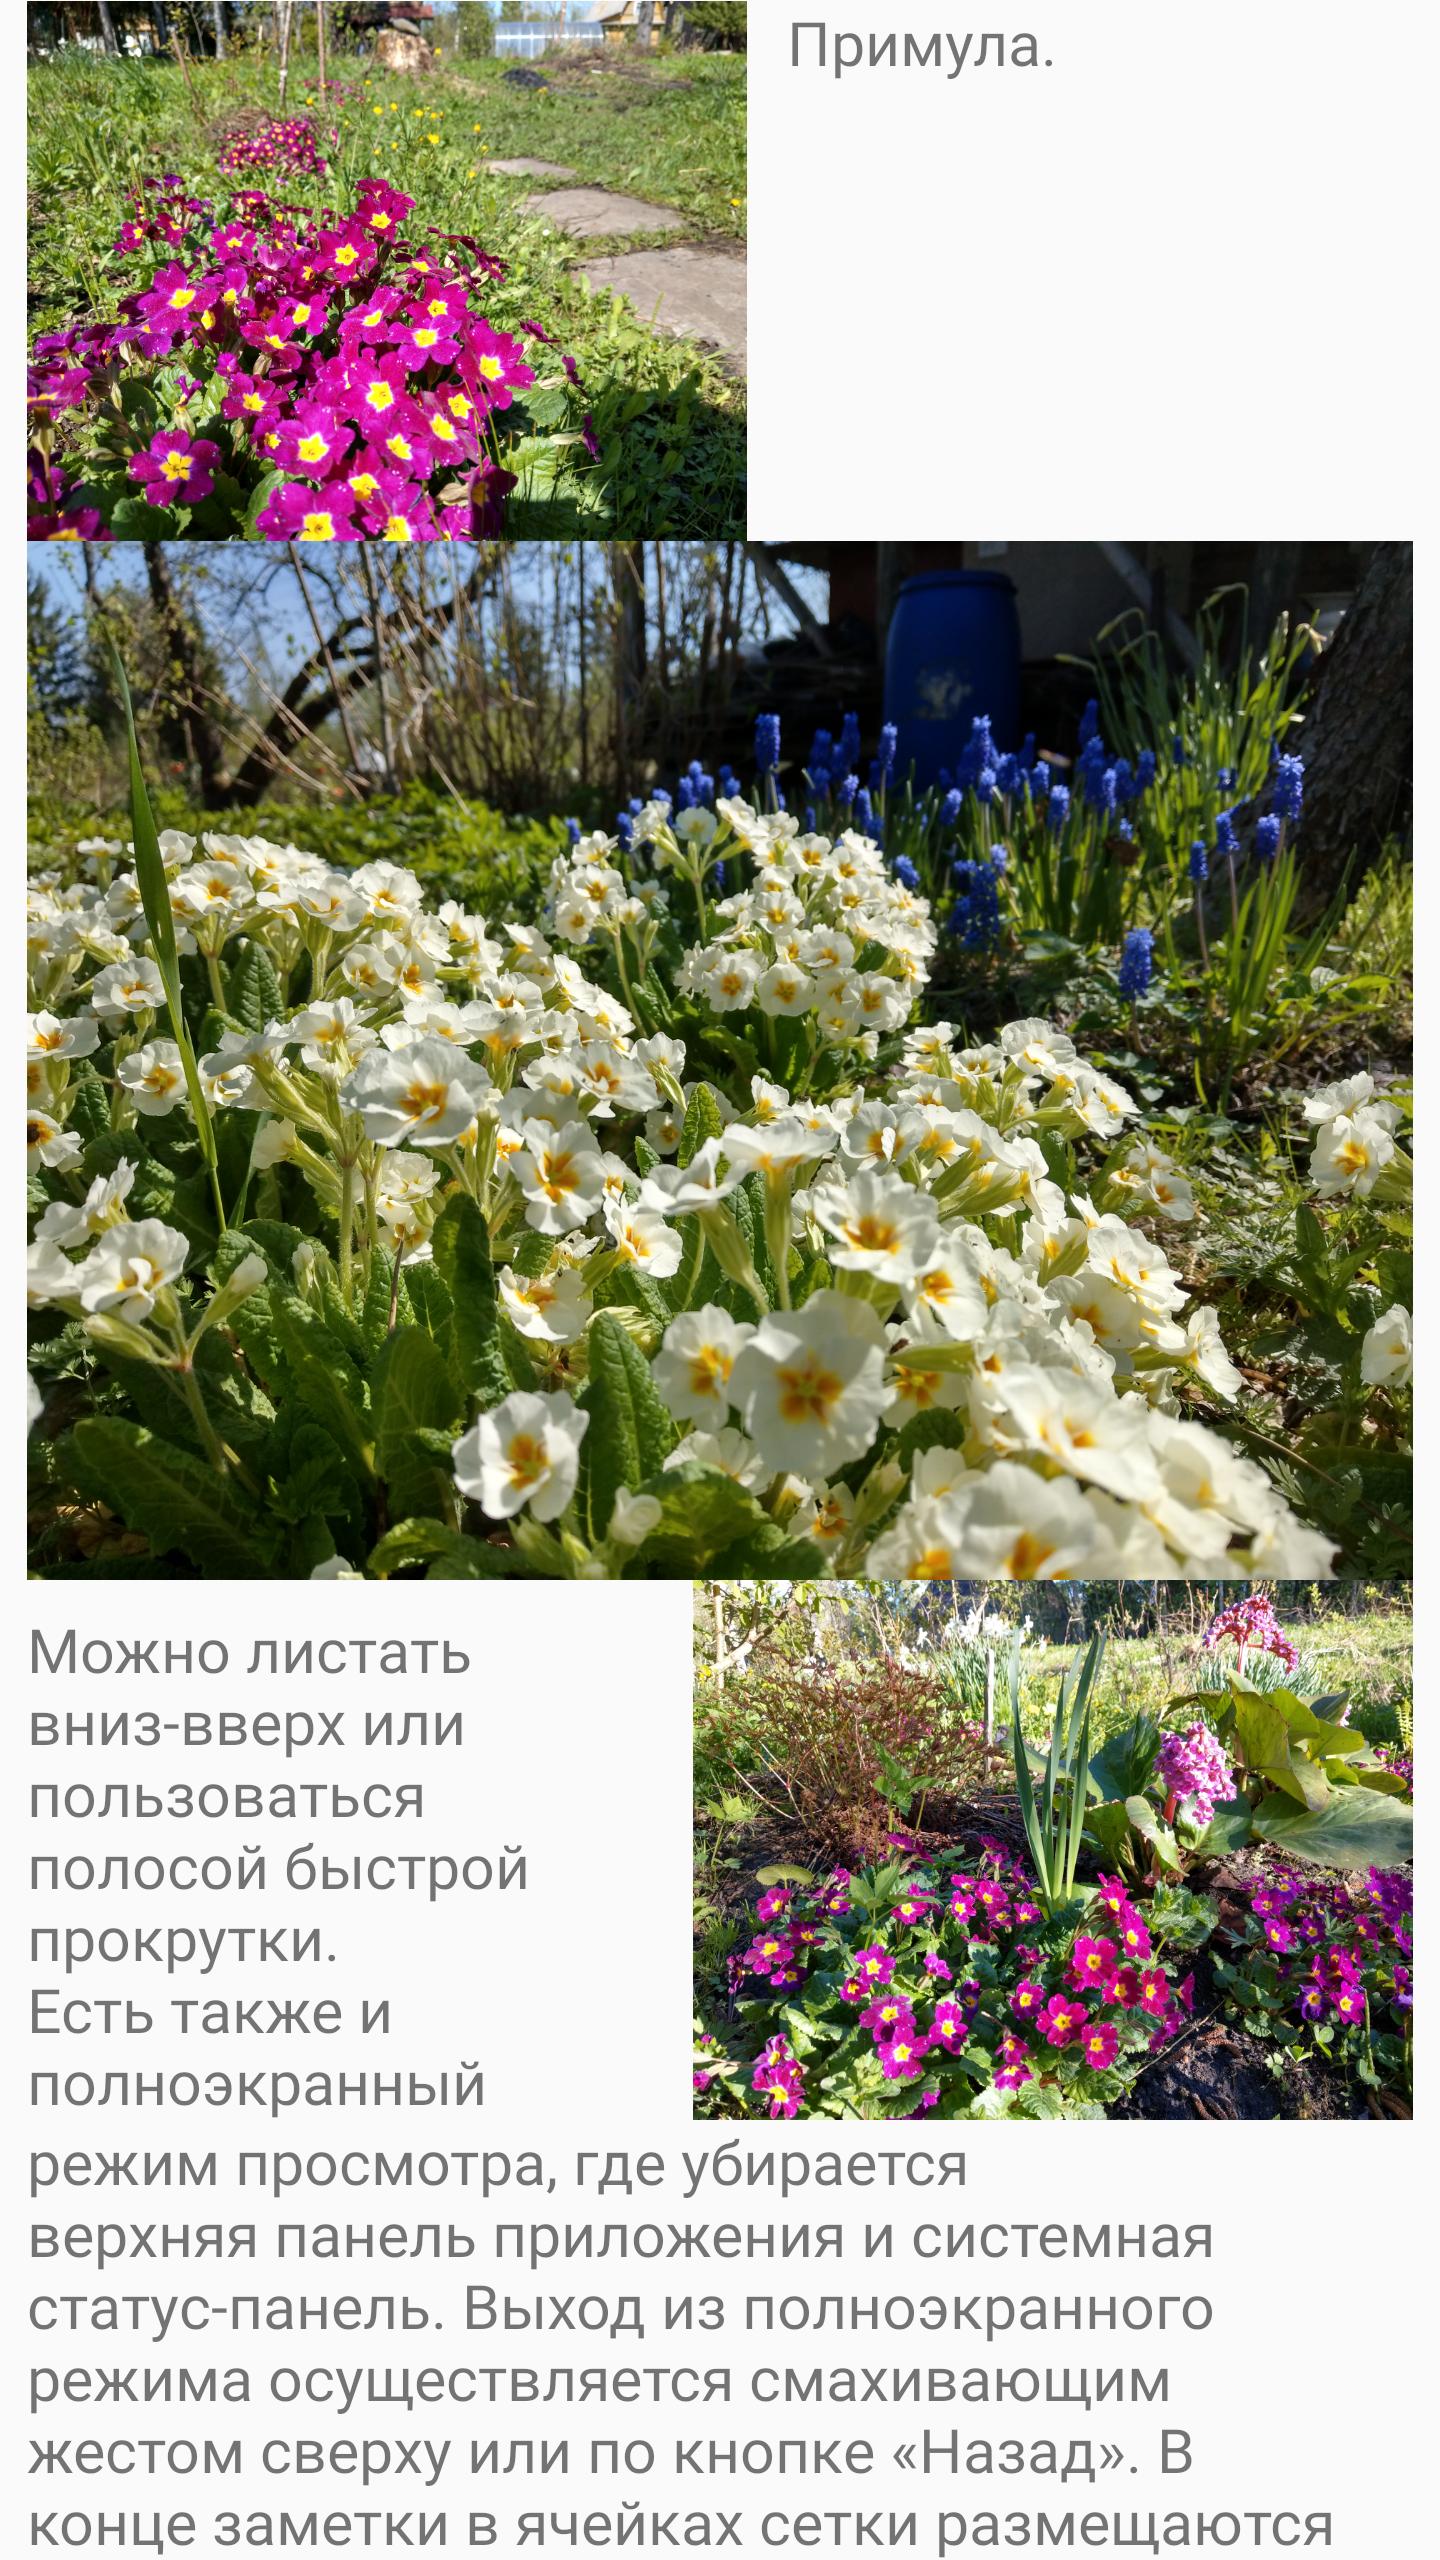 Изображения в центре и текст, огибающий изображение справа